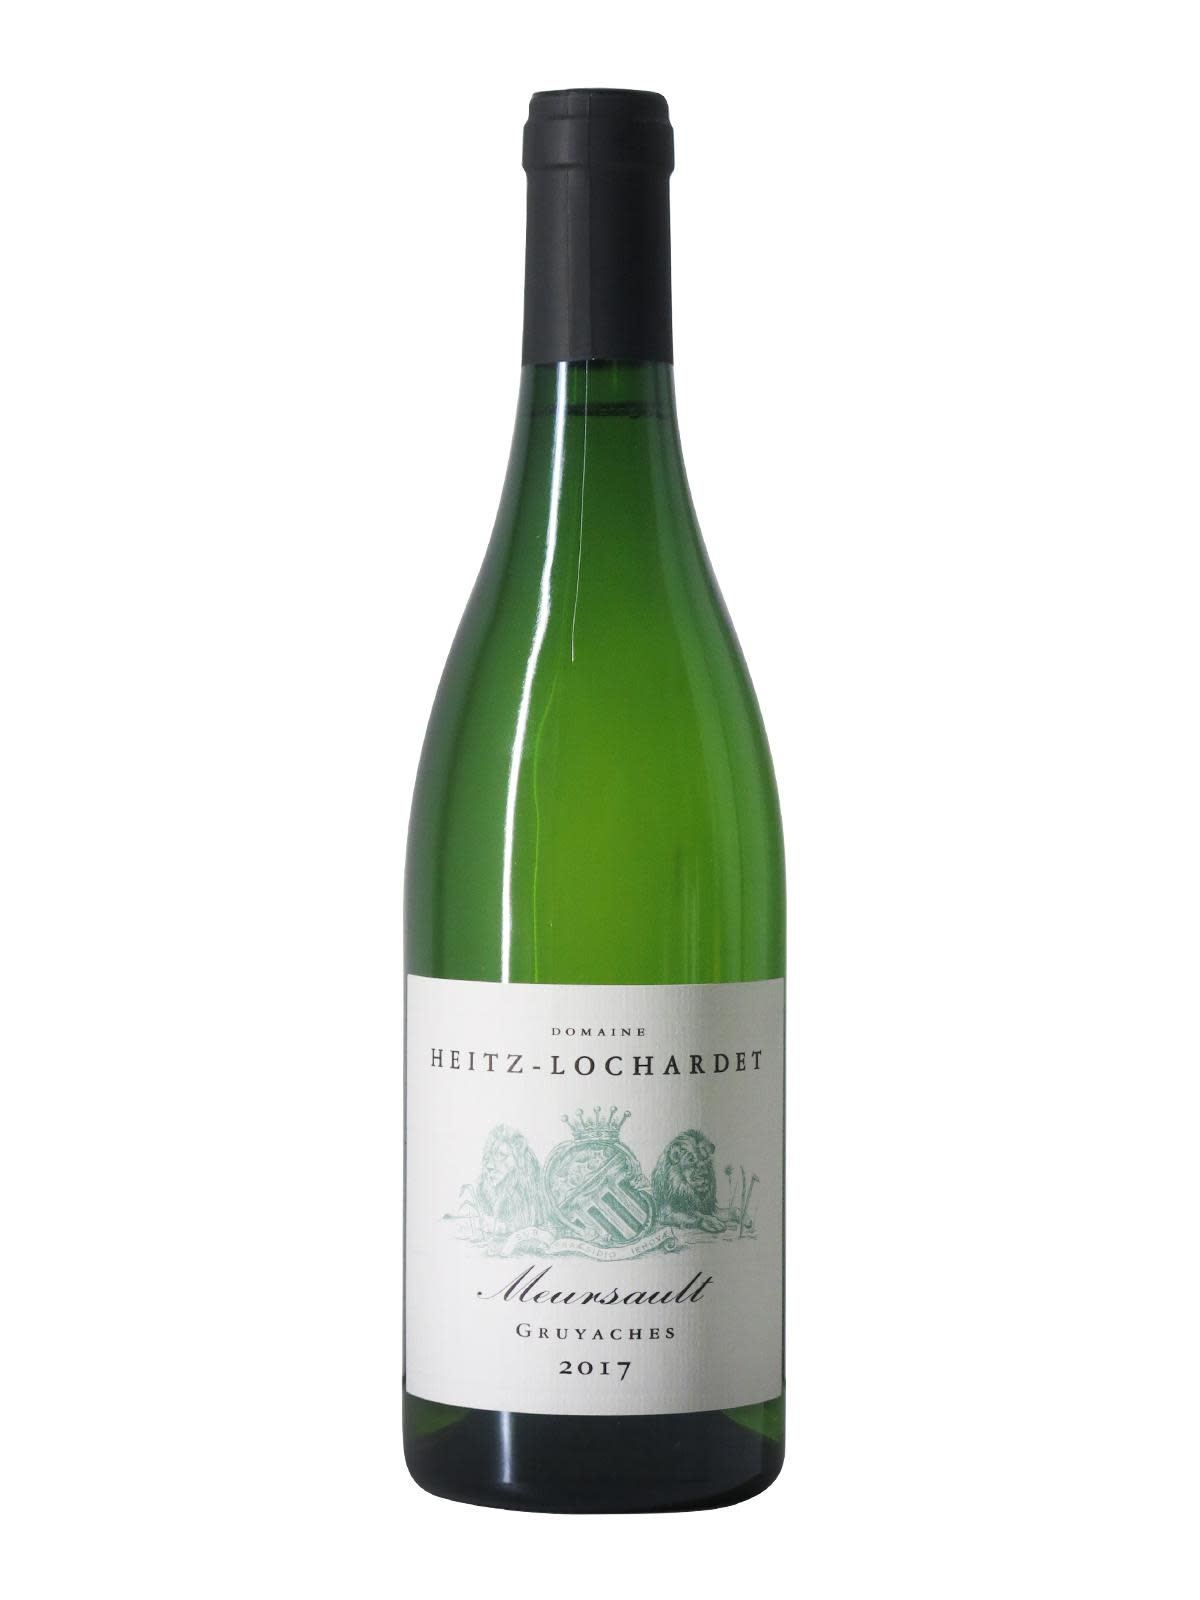 "Heitz-Lochardet Meursault ""Les Gruyaches"" 2017 - 750ml"